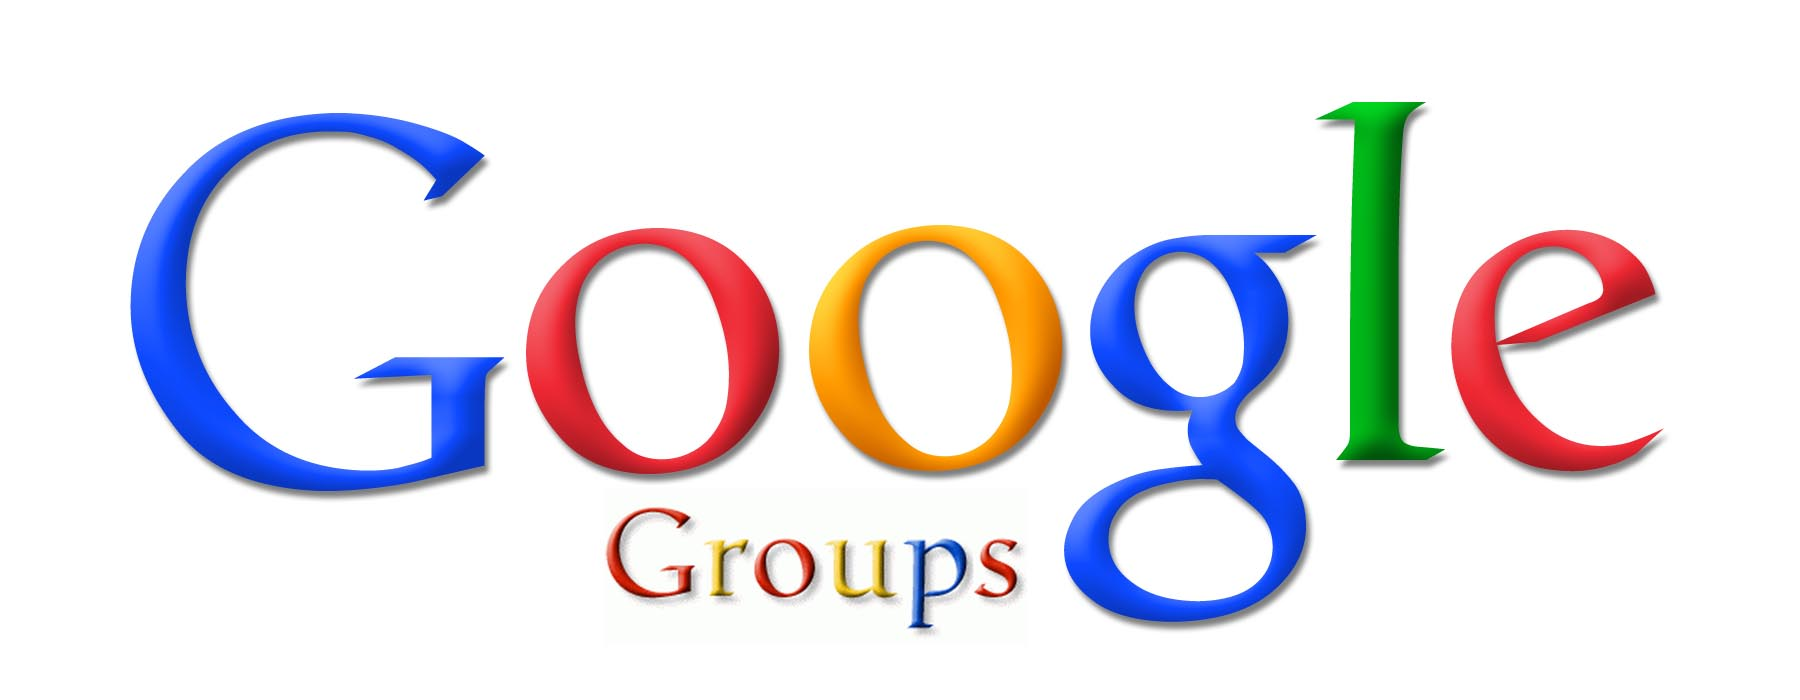 google-groups-logo